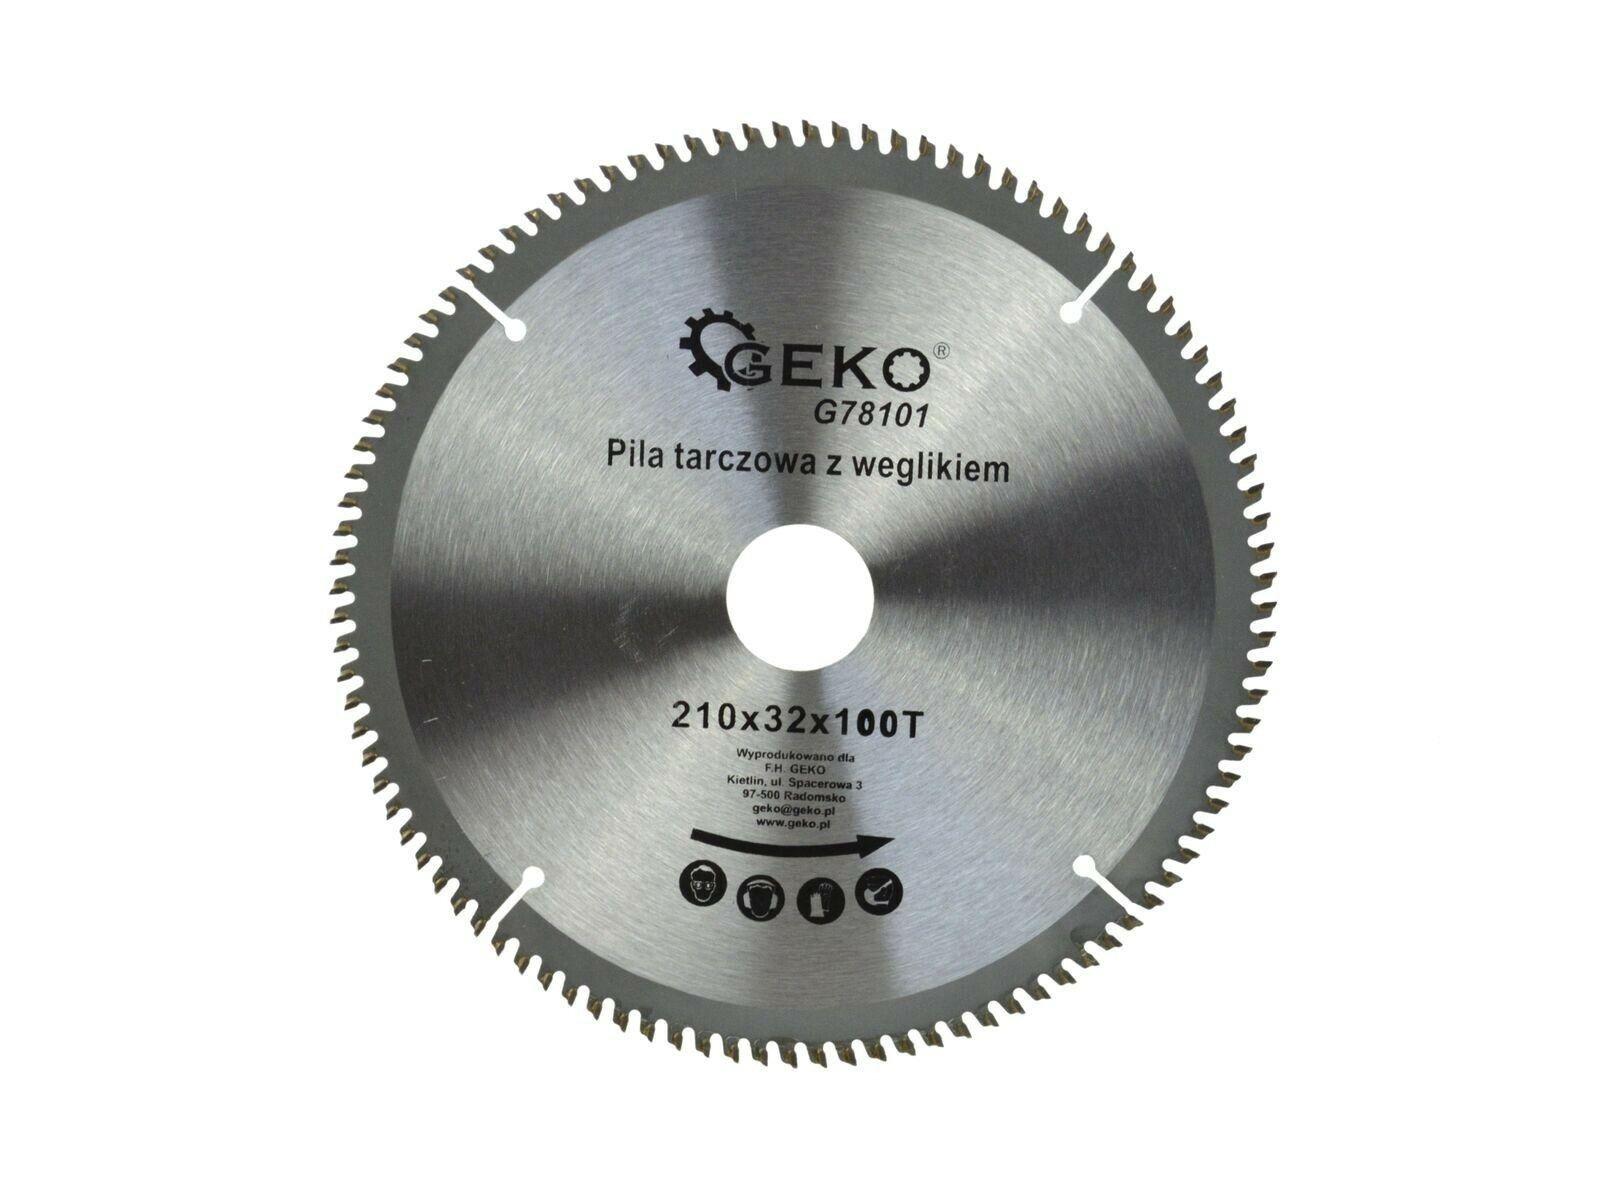 Kotouč řezný na hliník, 210x32 mm 100T, GEKO